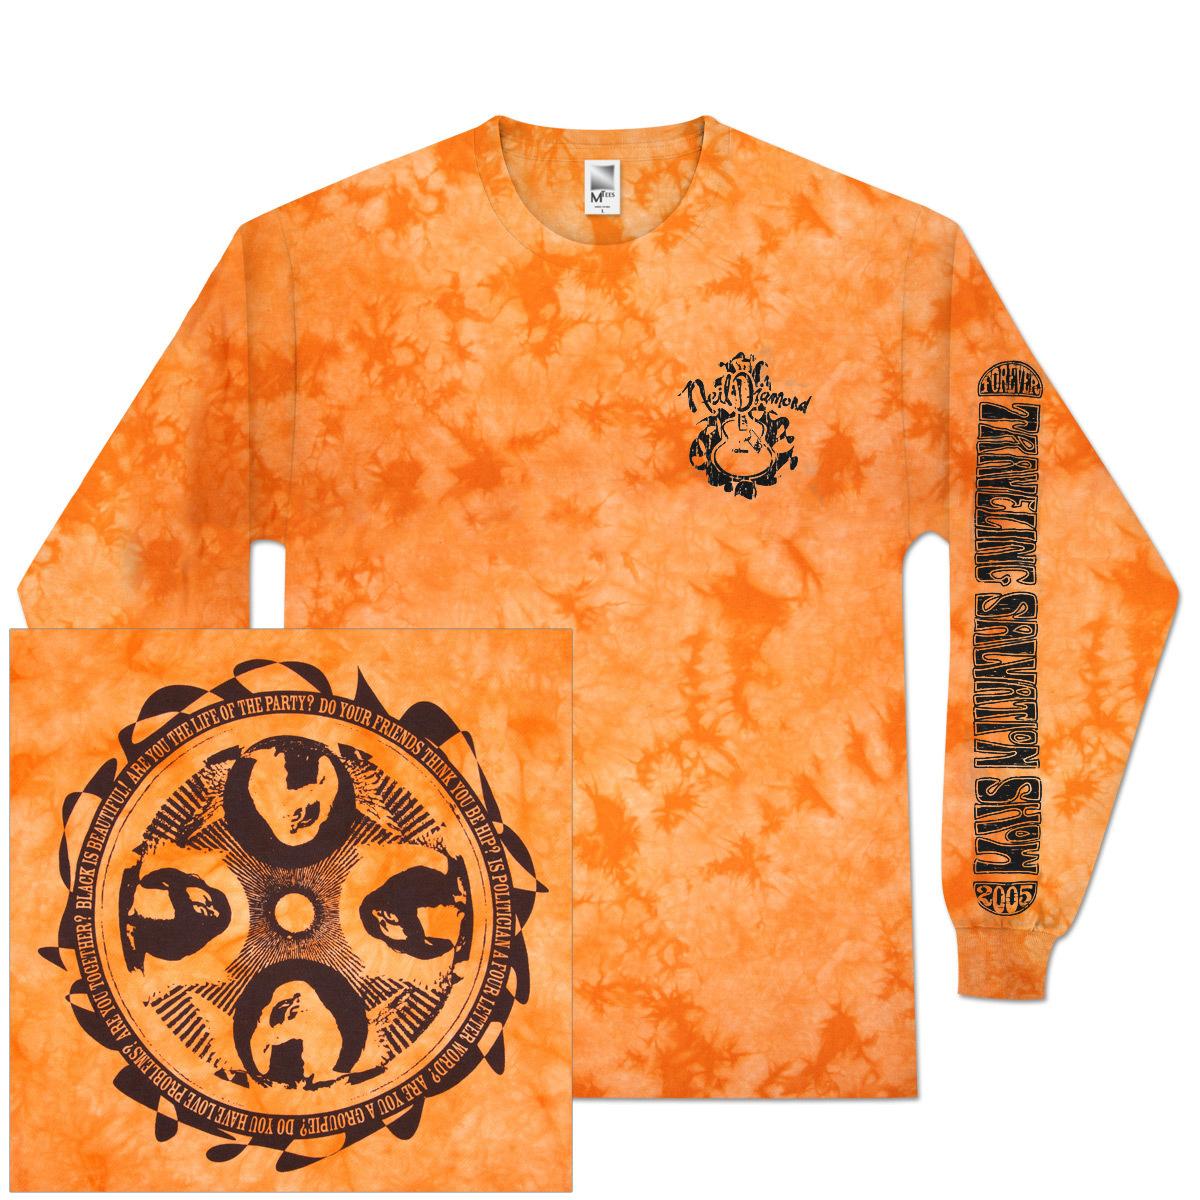 Traveling Salvation Show '05 Long Sleeve T-Shirt